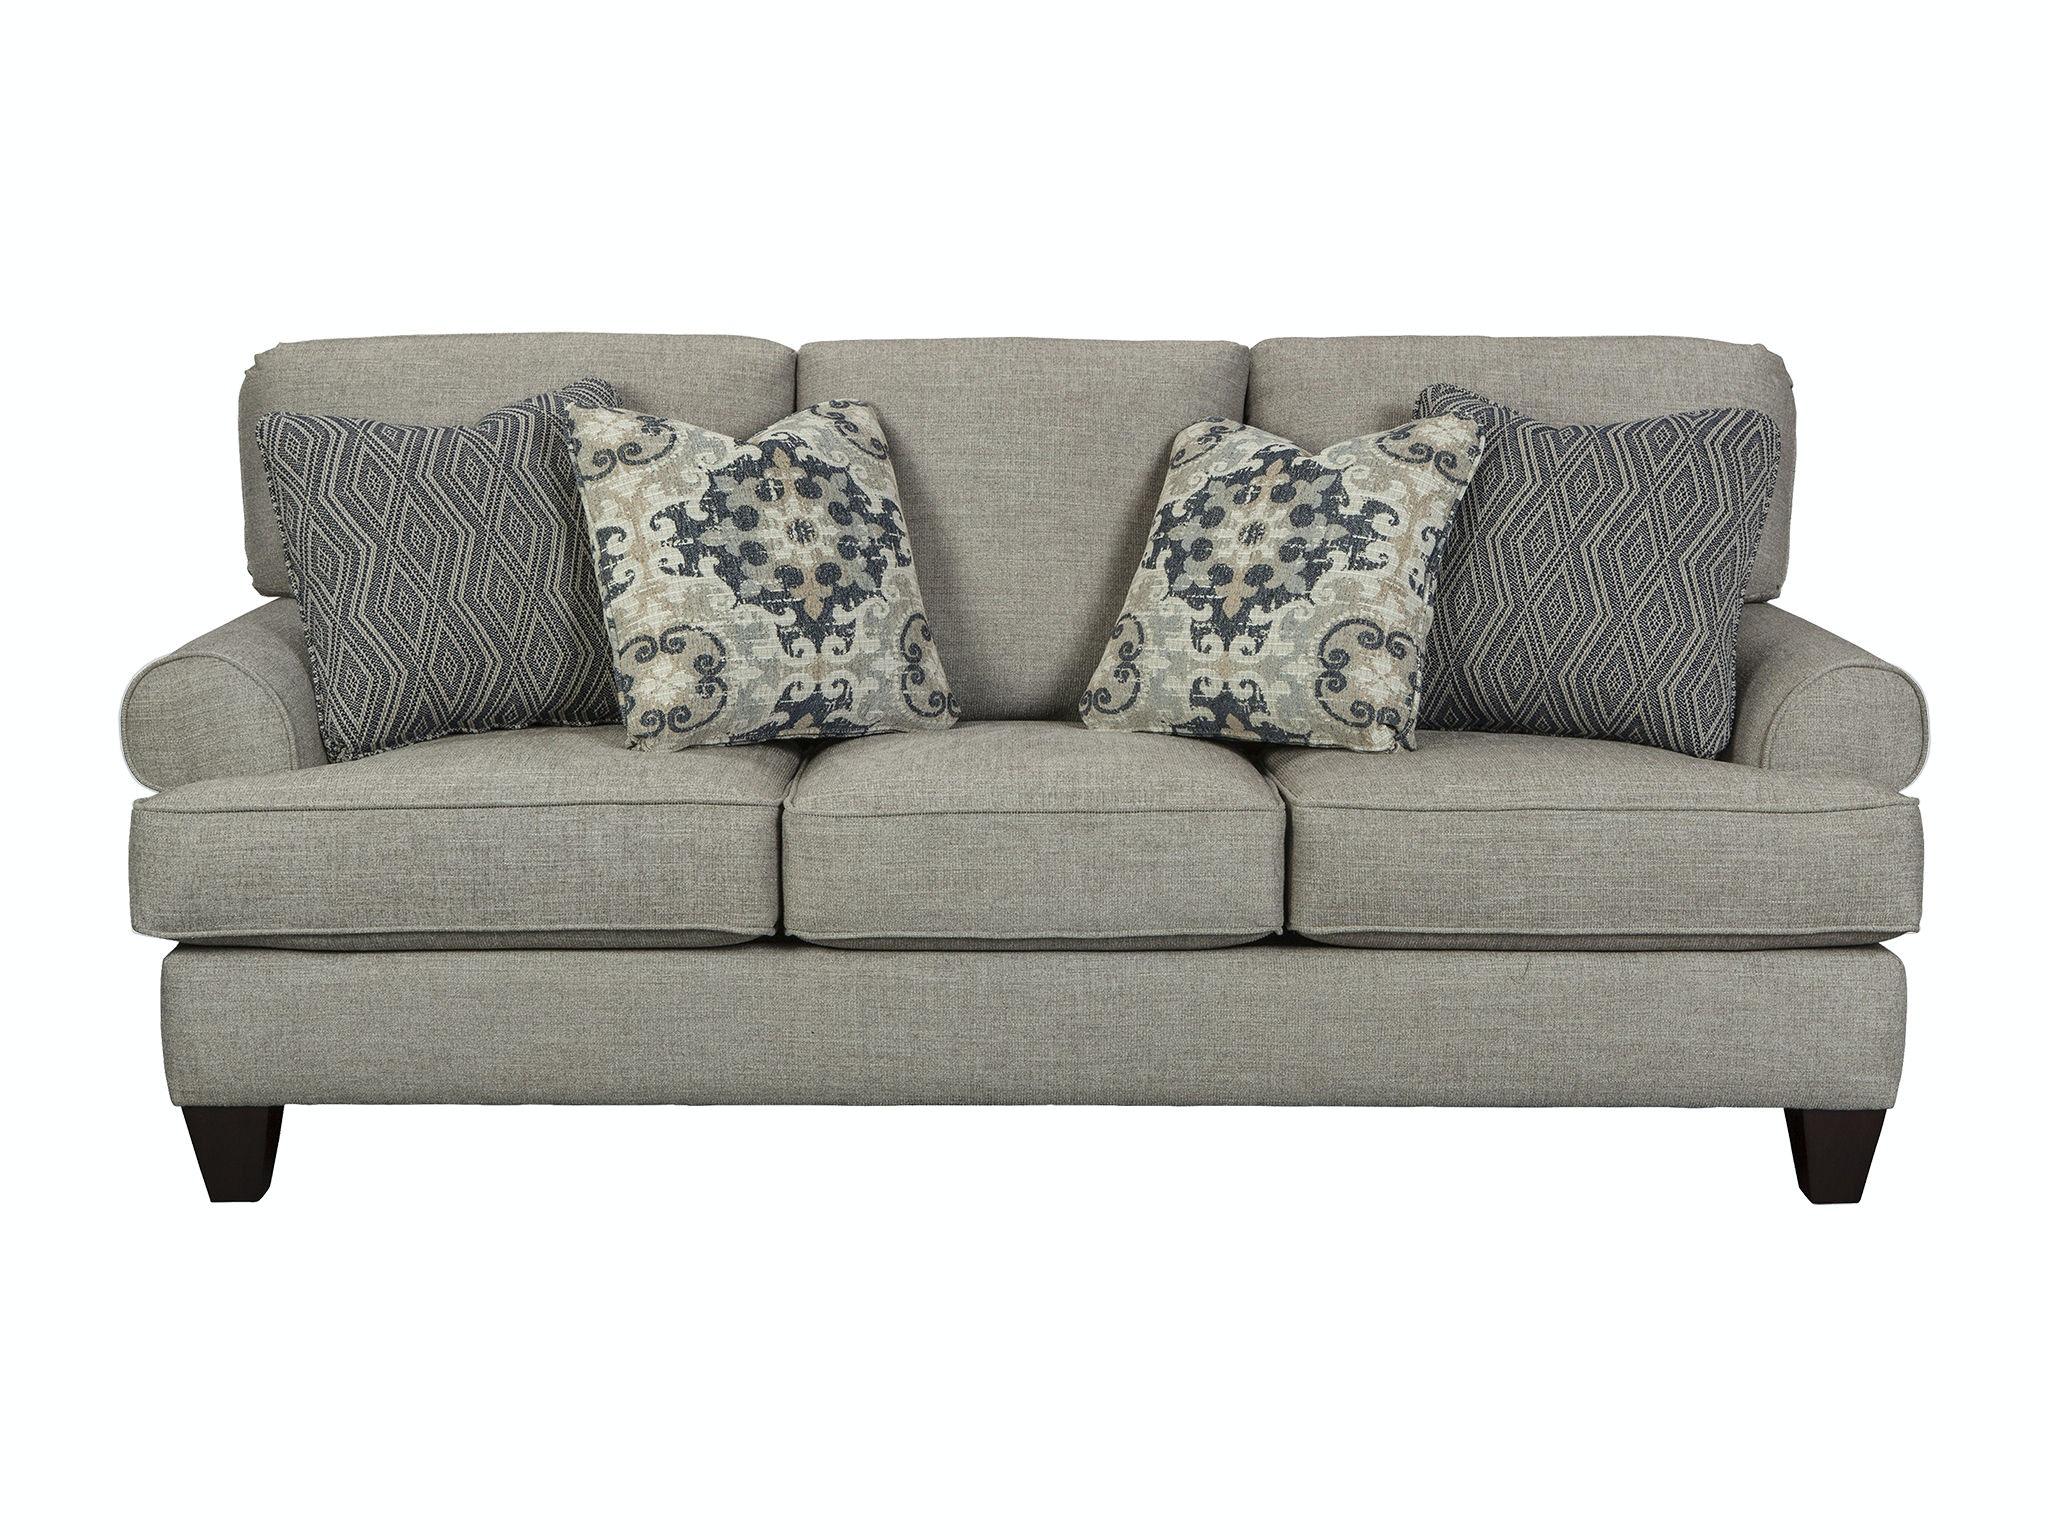 Craftmaster Living Room Sleeper Sofa 77135068 CraftMaster